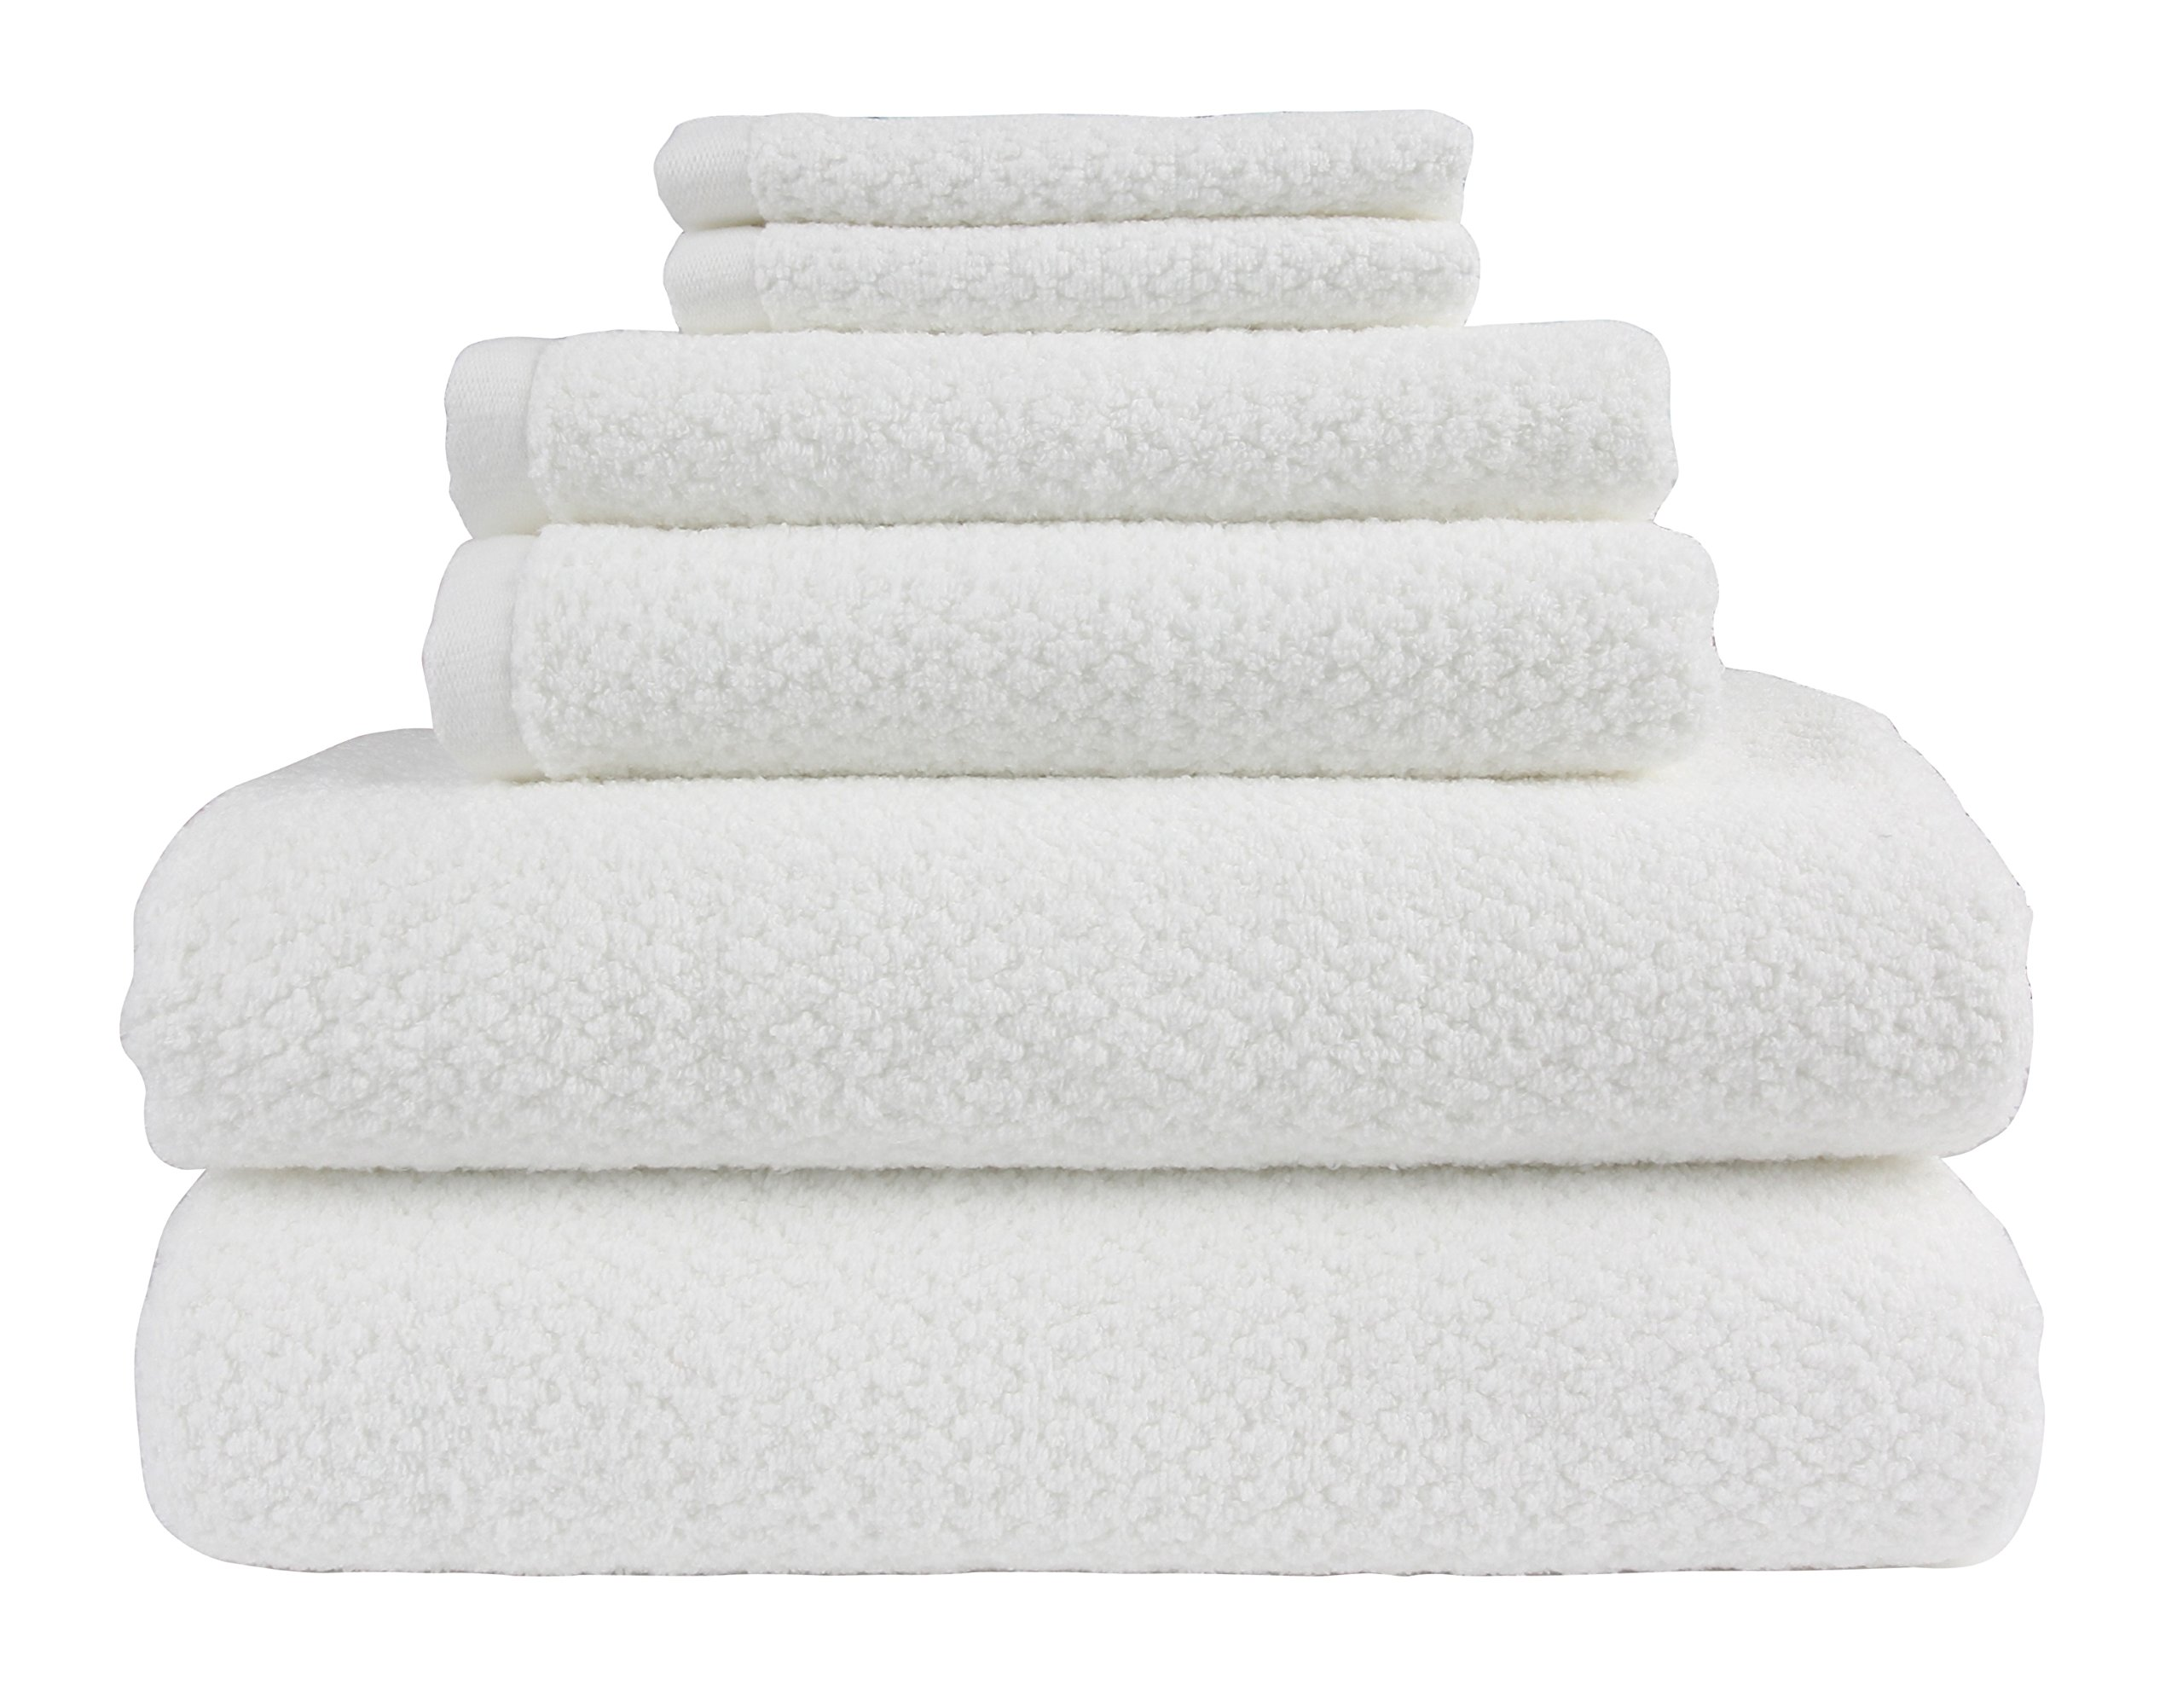 Everplush Diamond Jacquard Bath Towel 6 Piece Value Pack in White